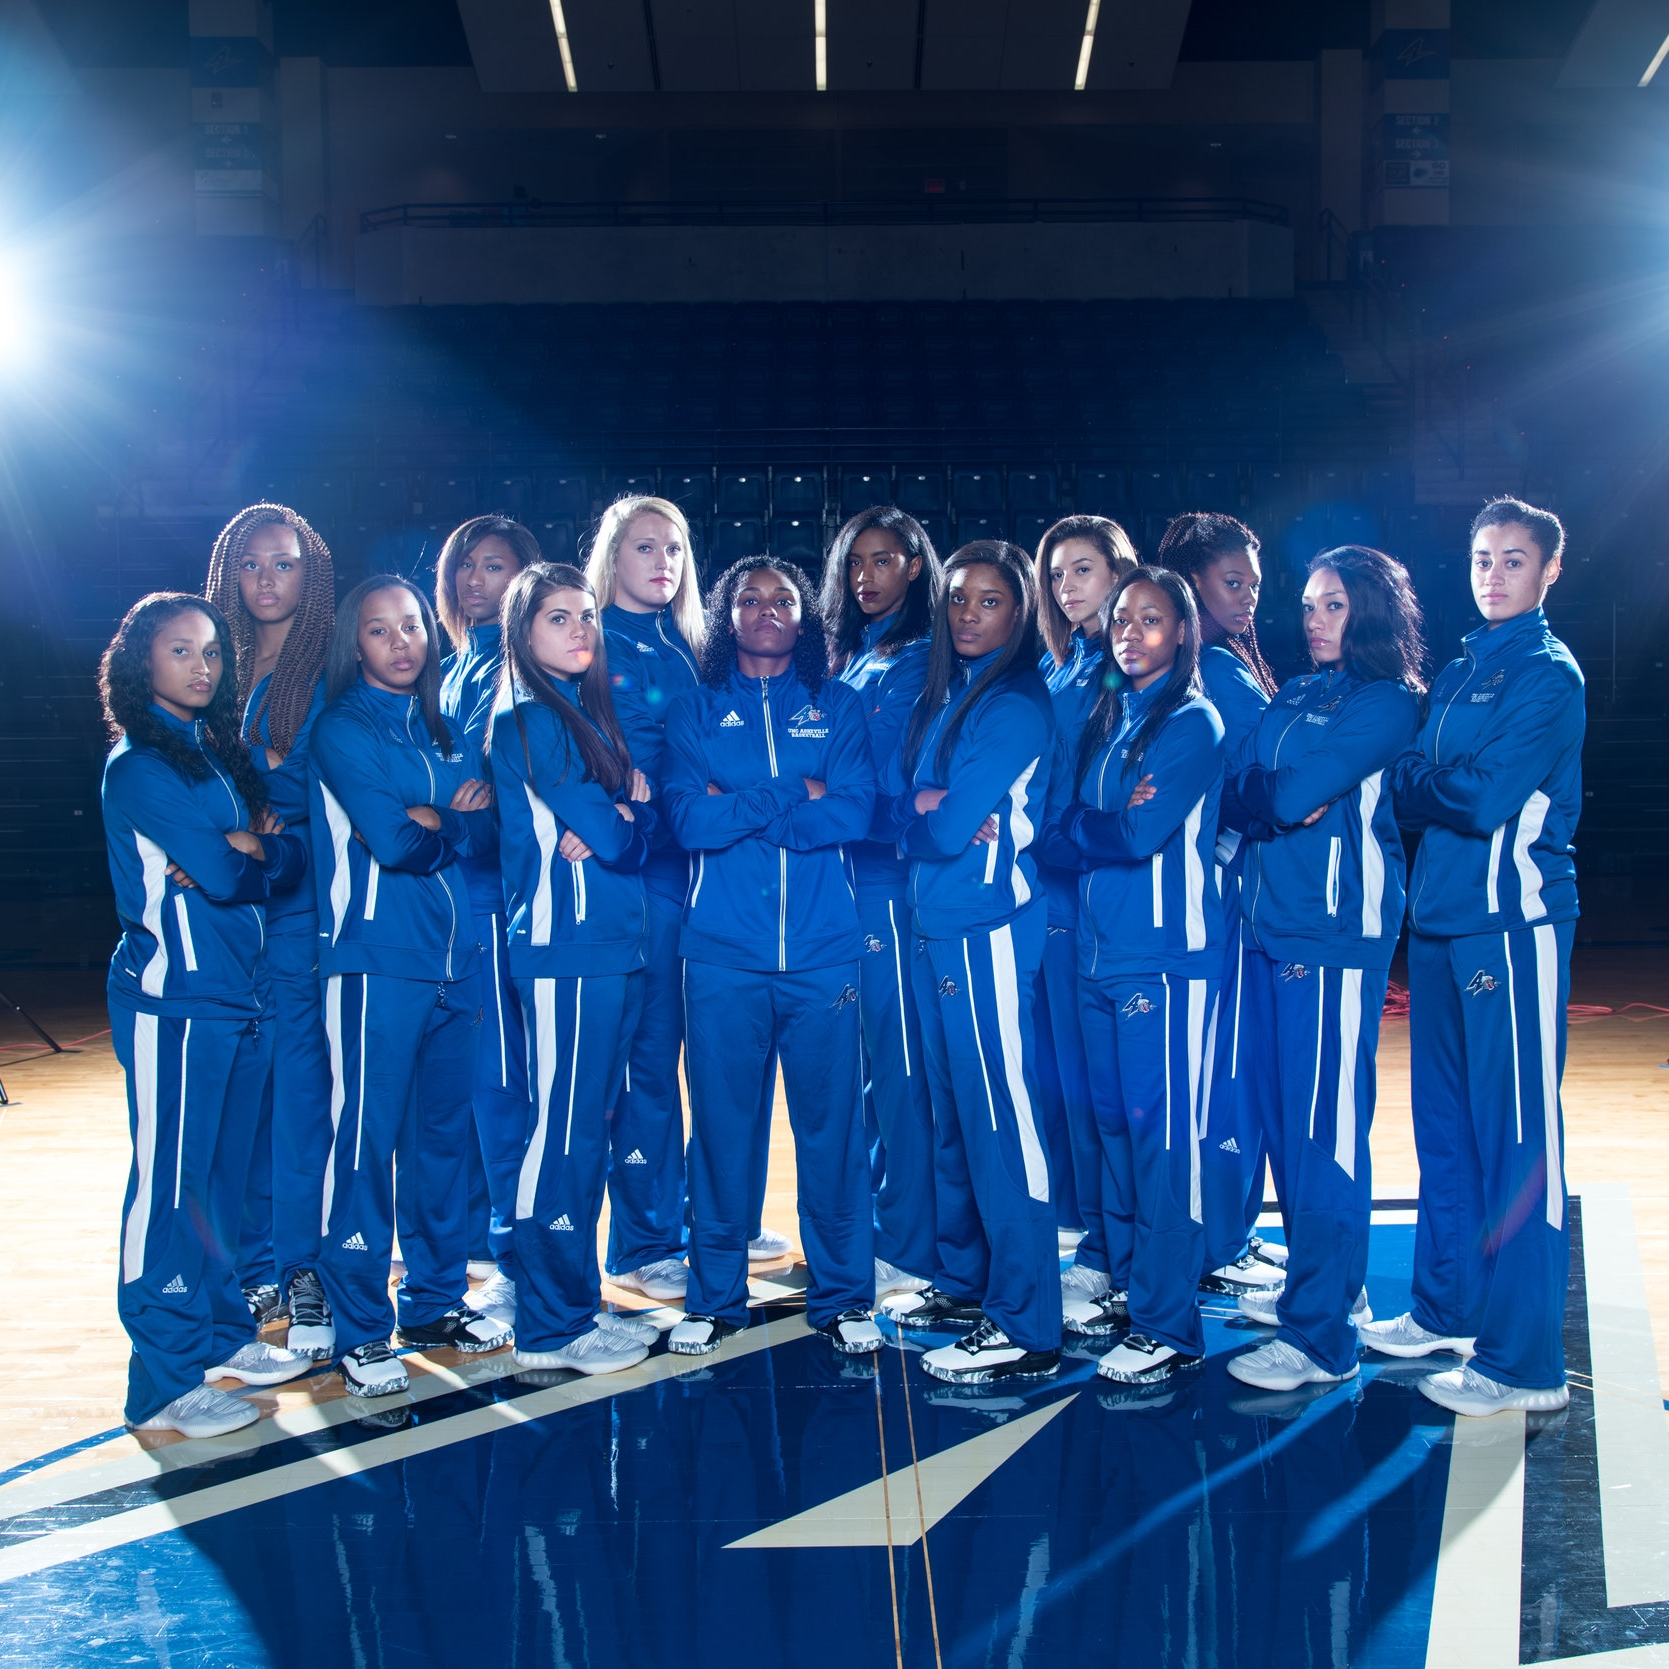 Women's Basketball Team Photos-7.jpg